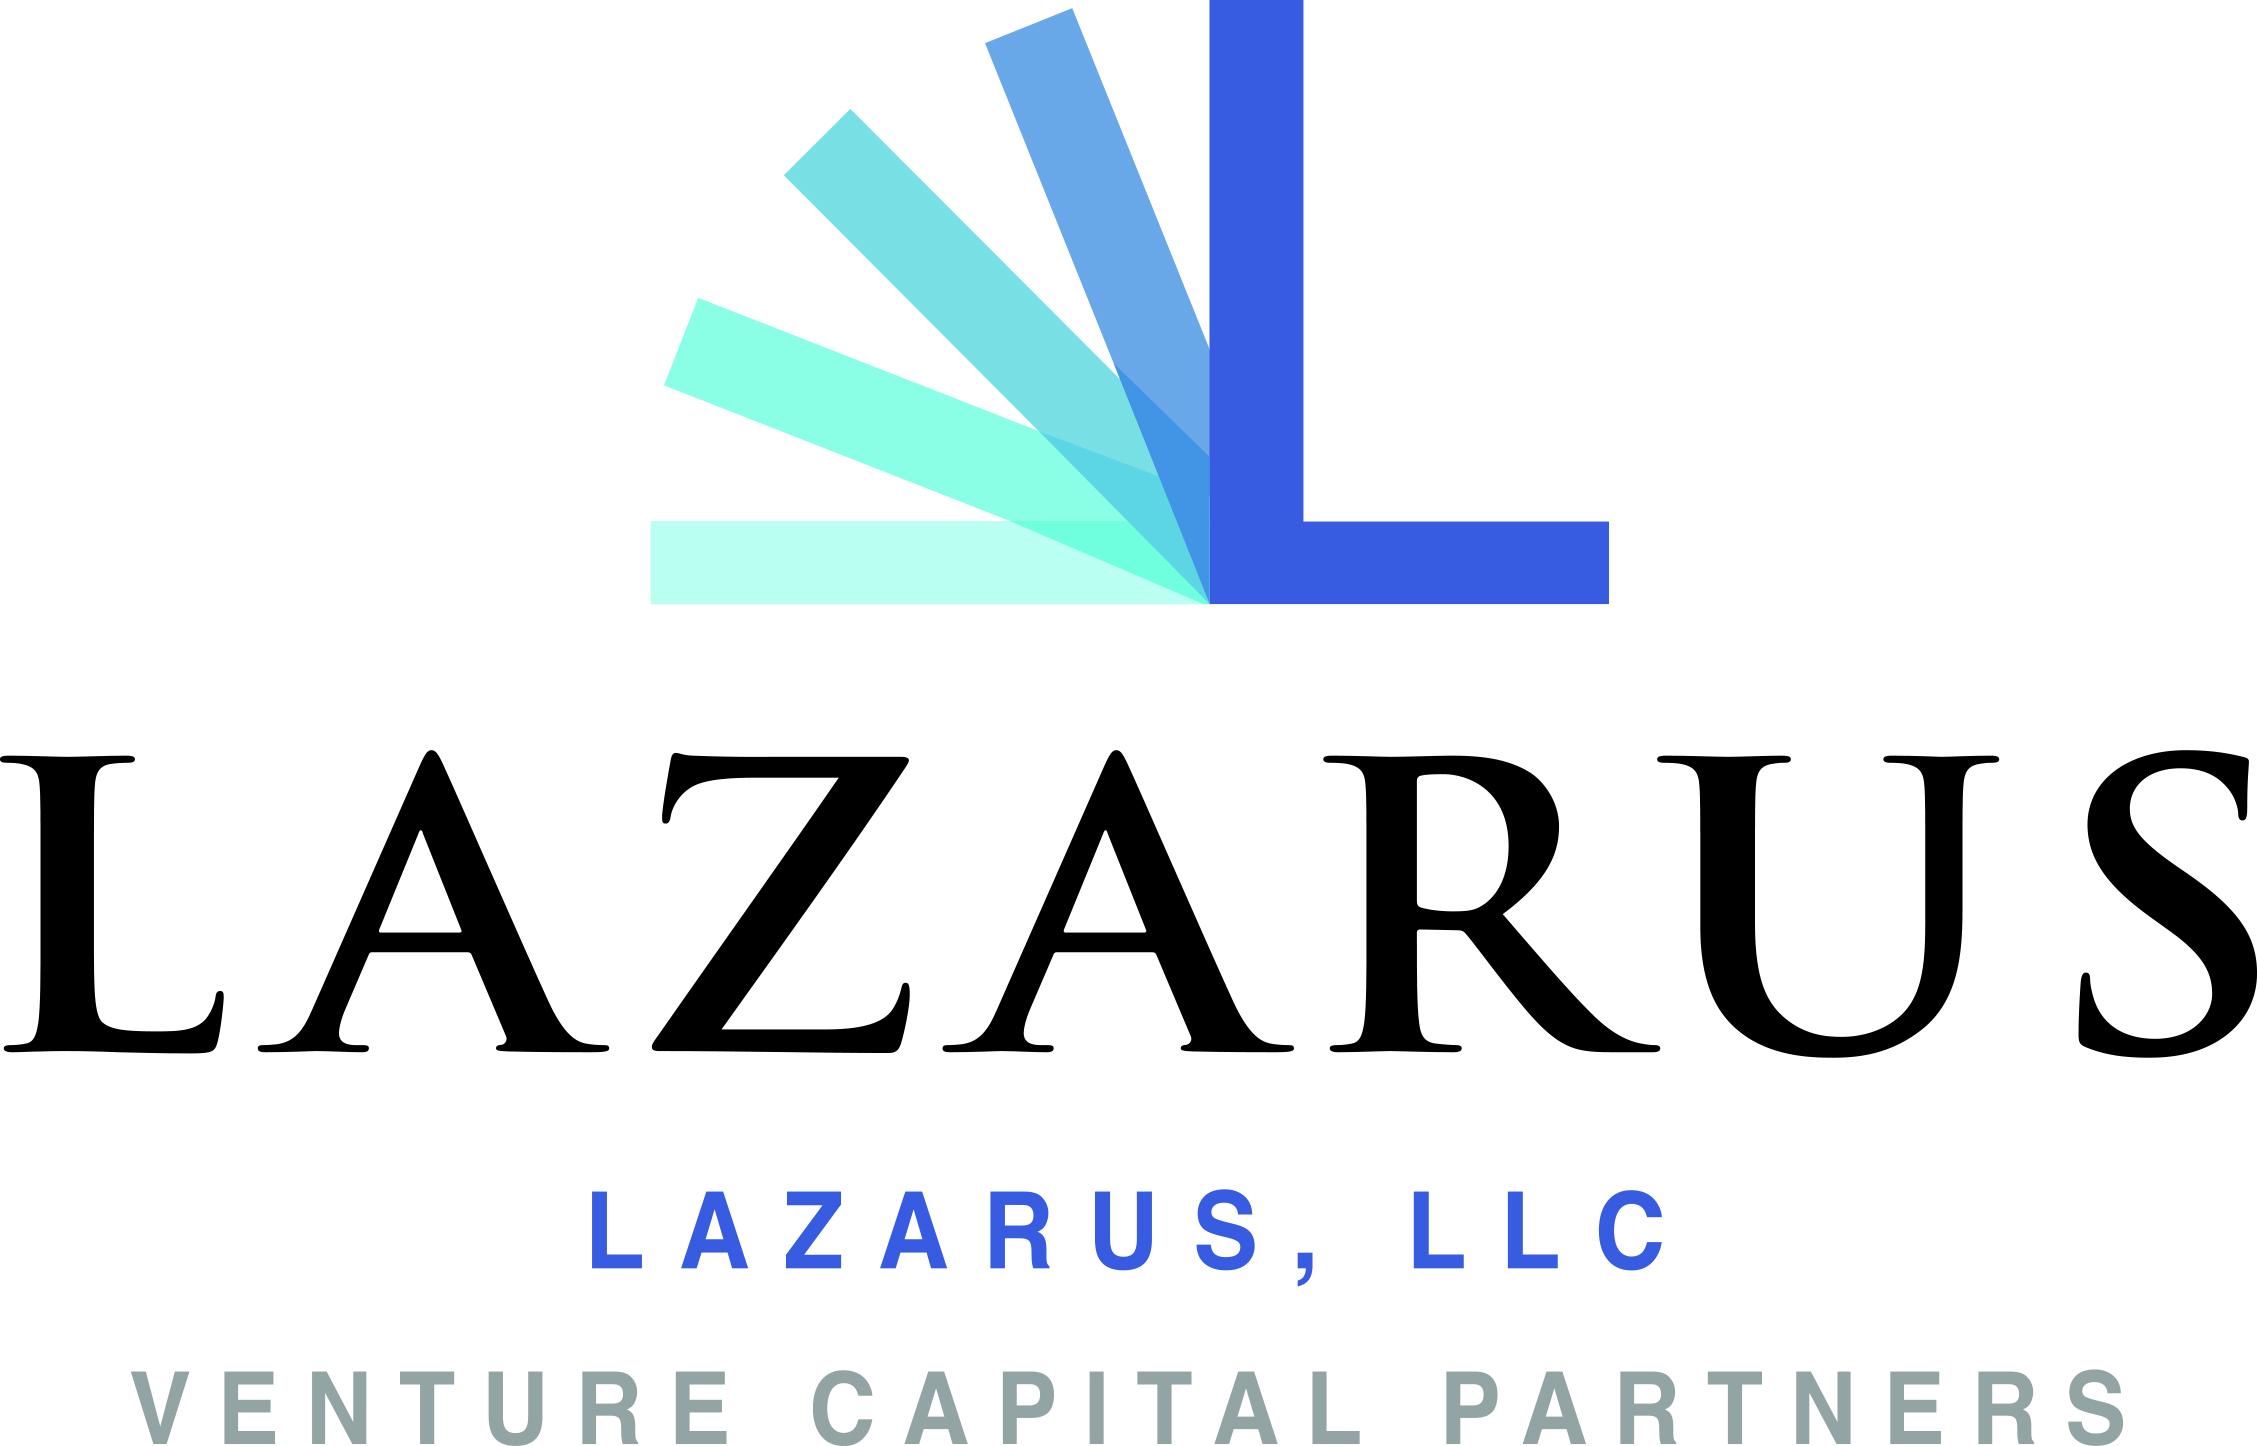 Lazarus, LLC